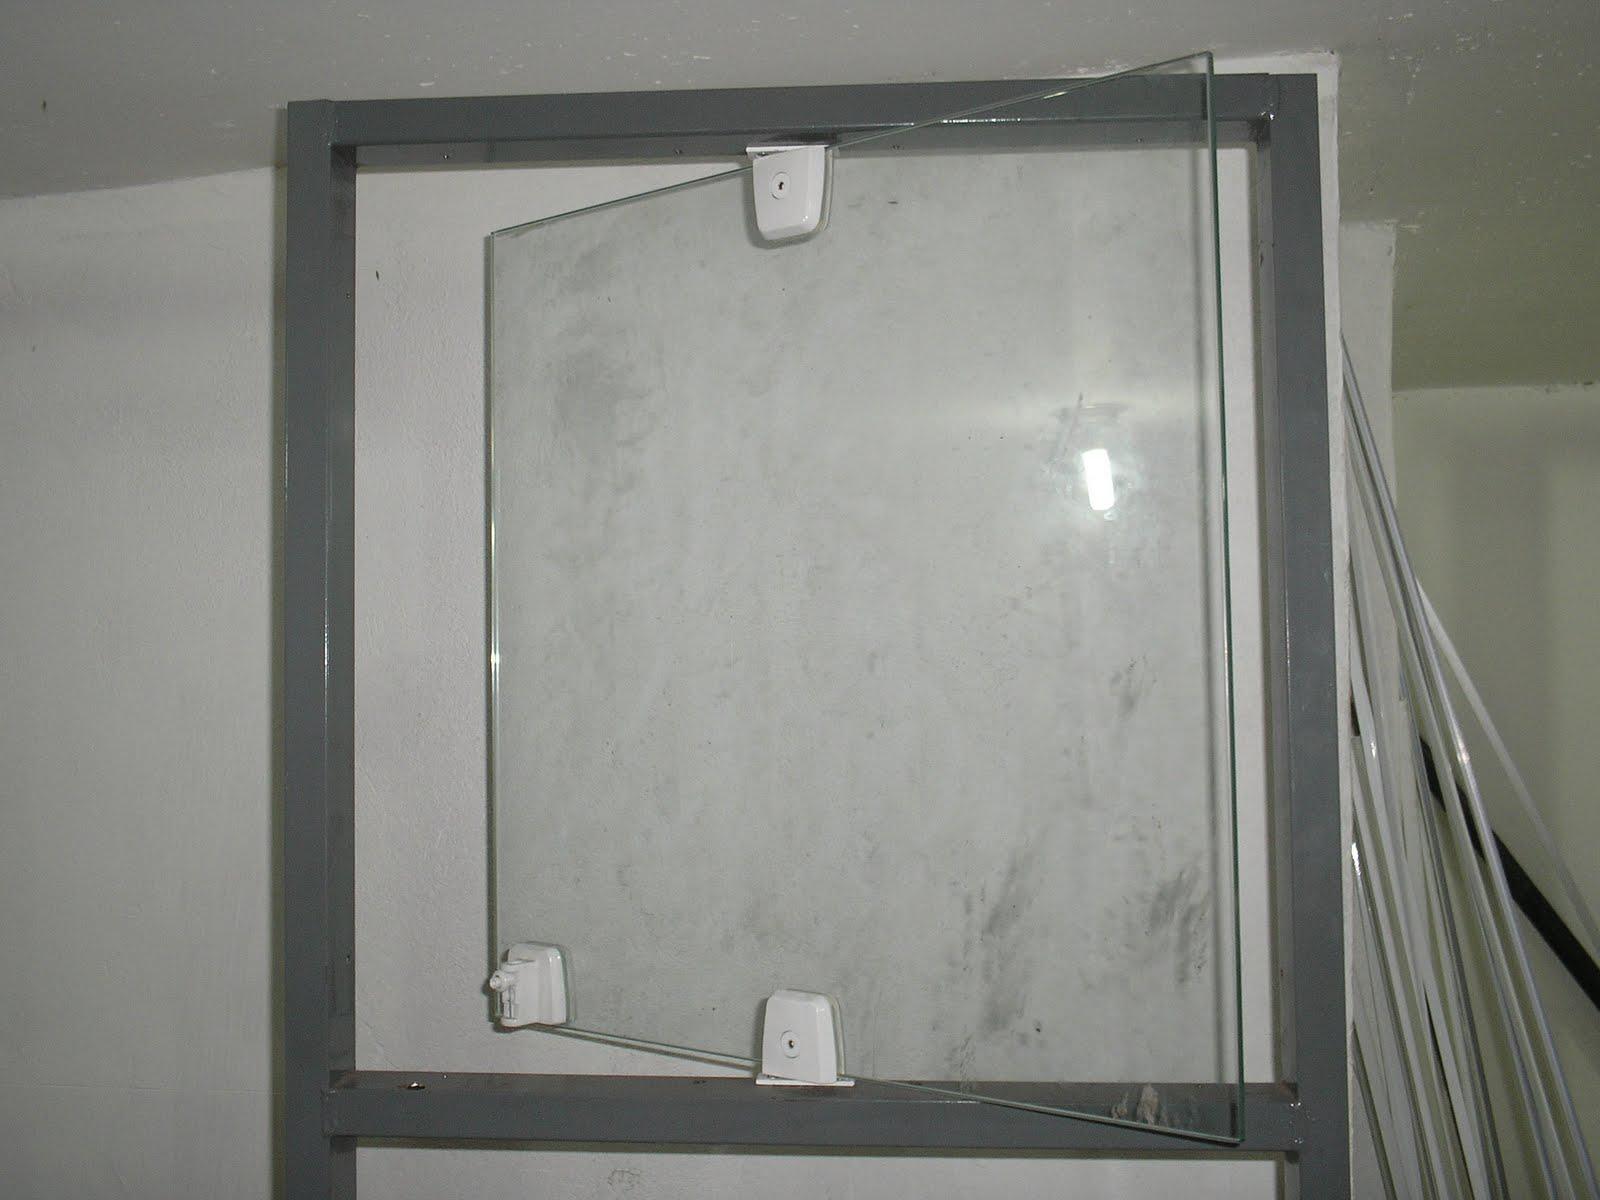 Design Aluminium: Pivotante vidro temperado #5E6051 1600 1200